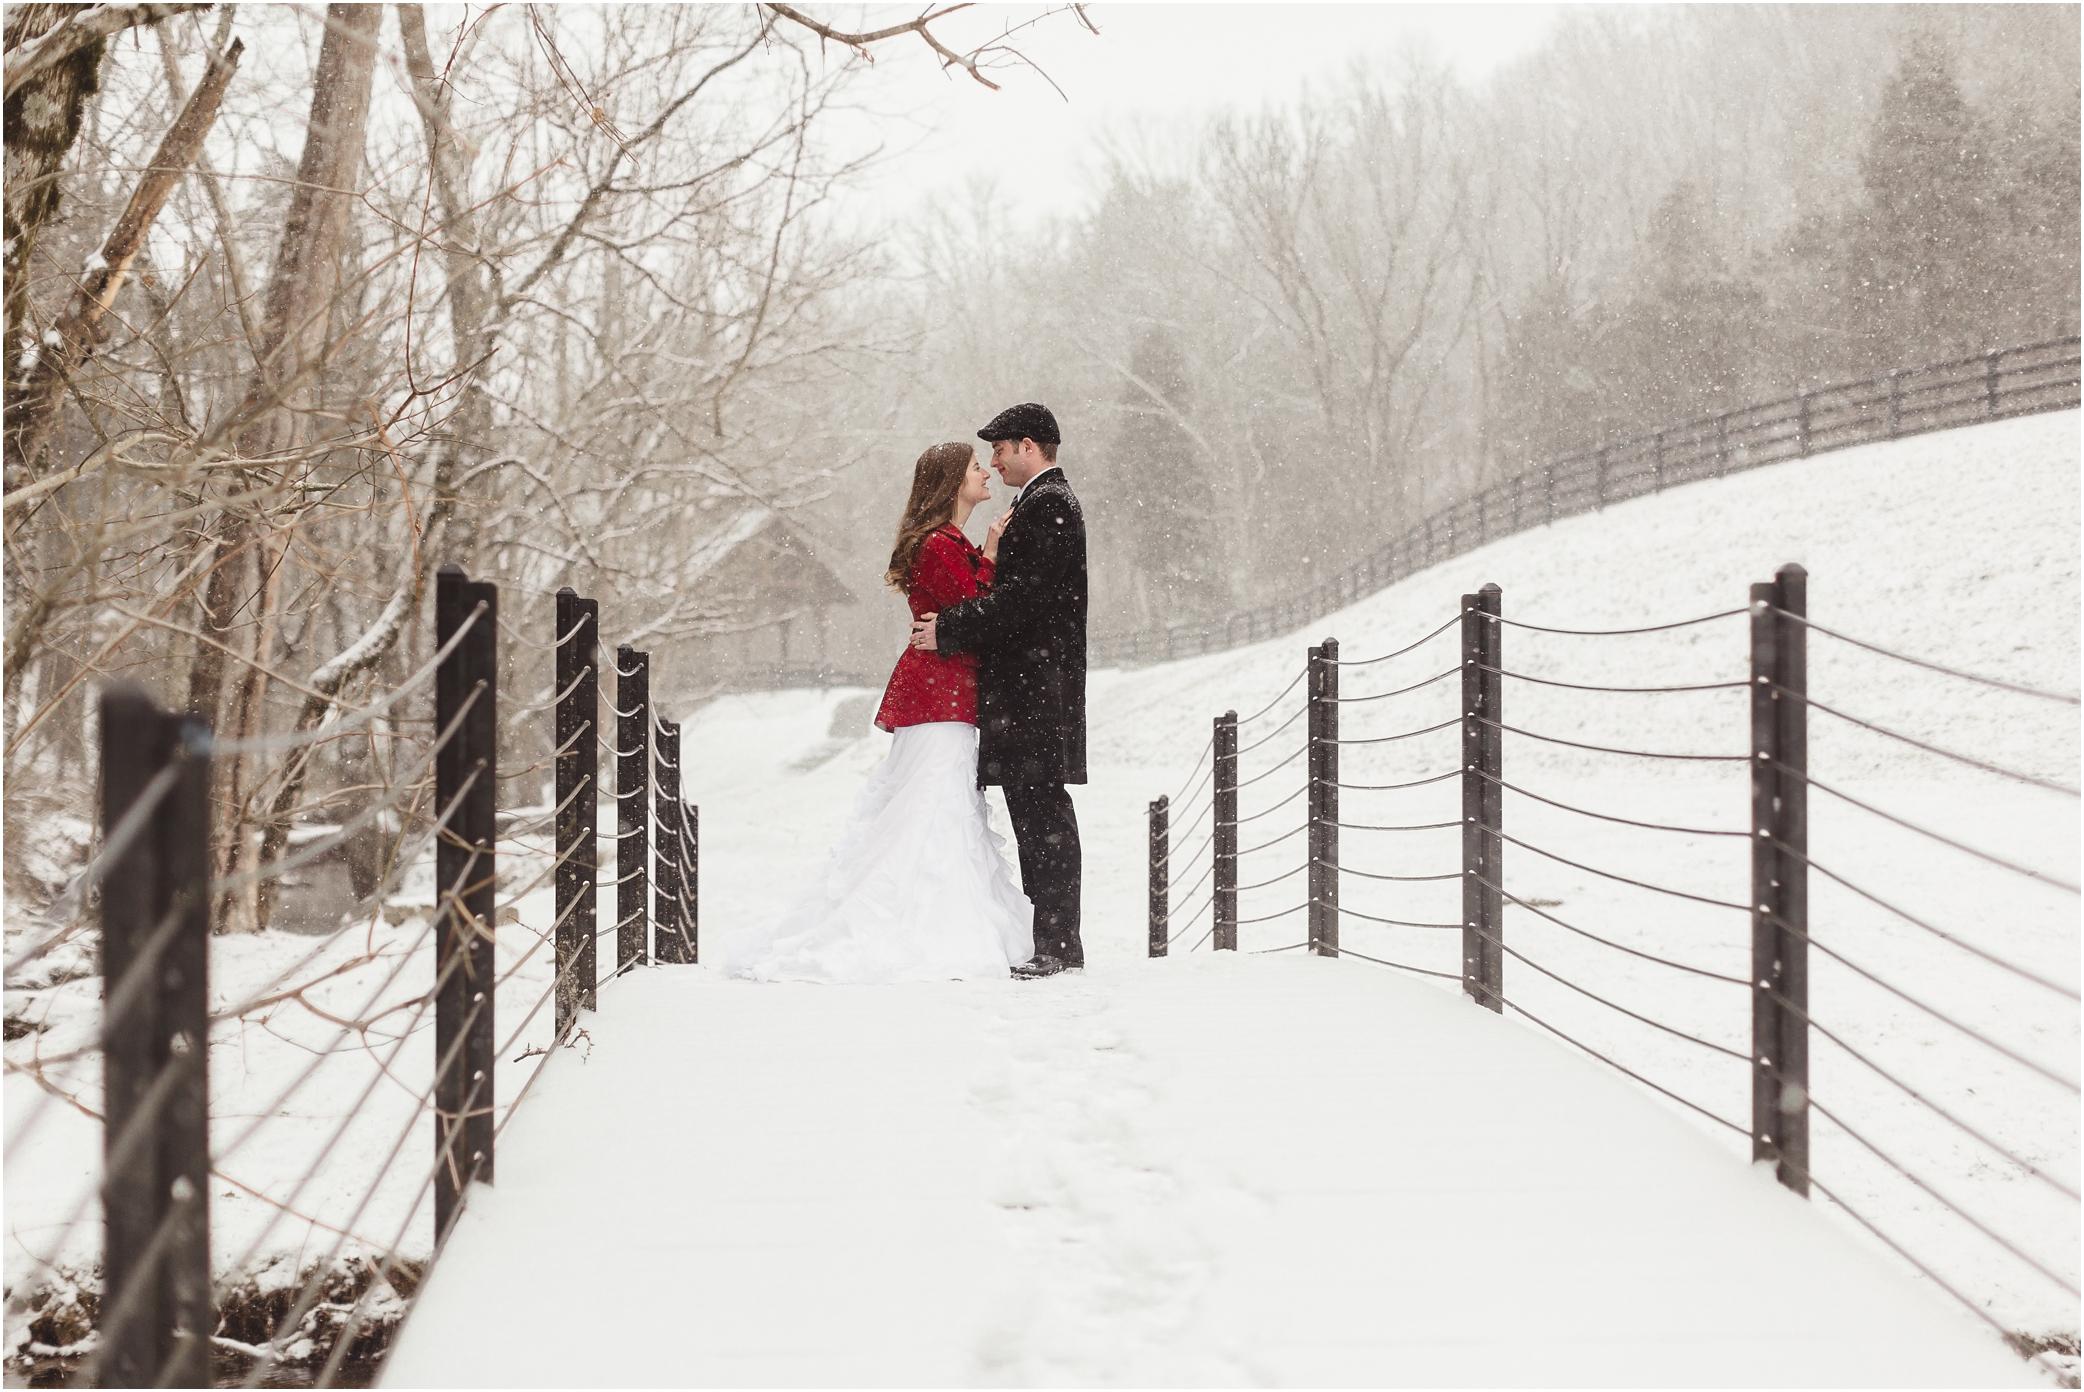 Fot. www.jophotoonline.com/